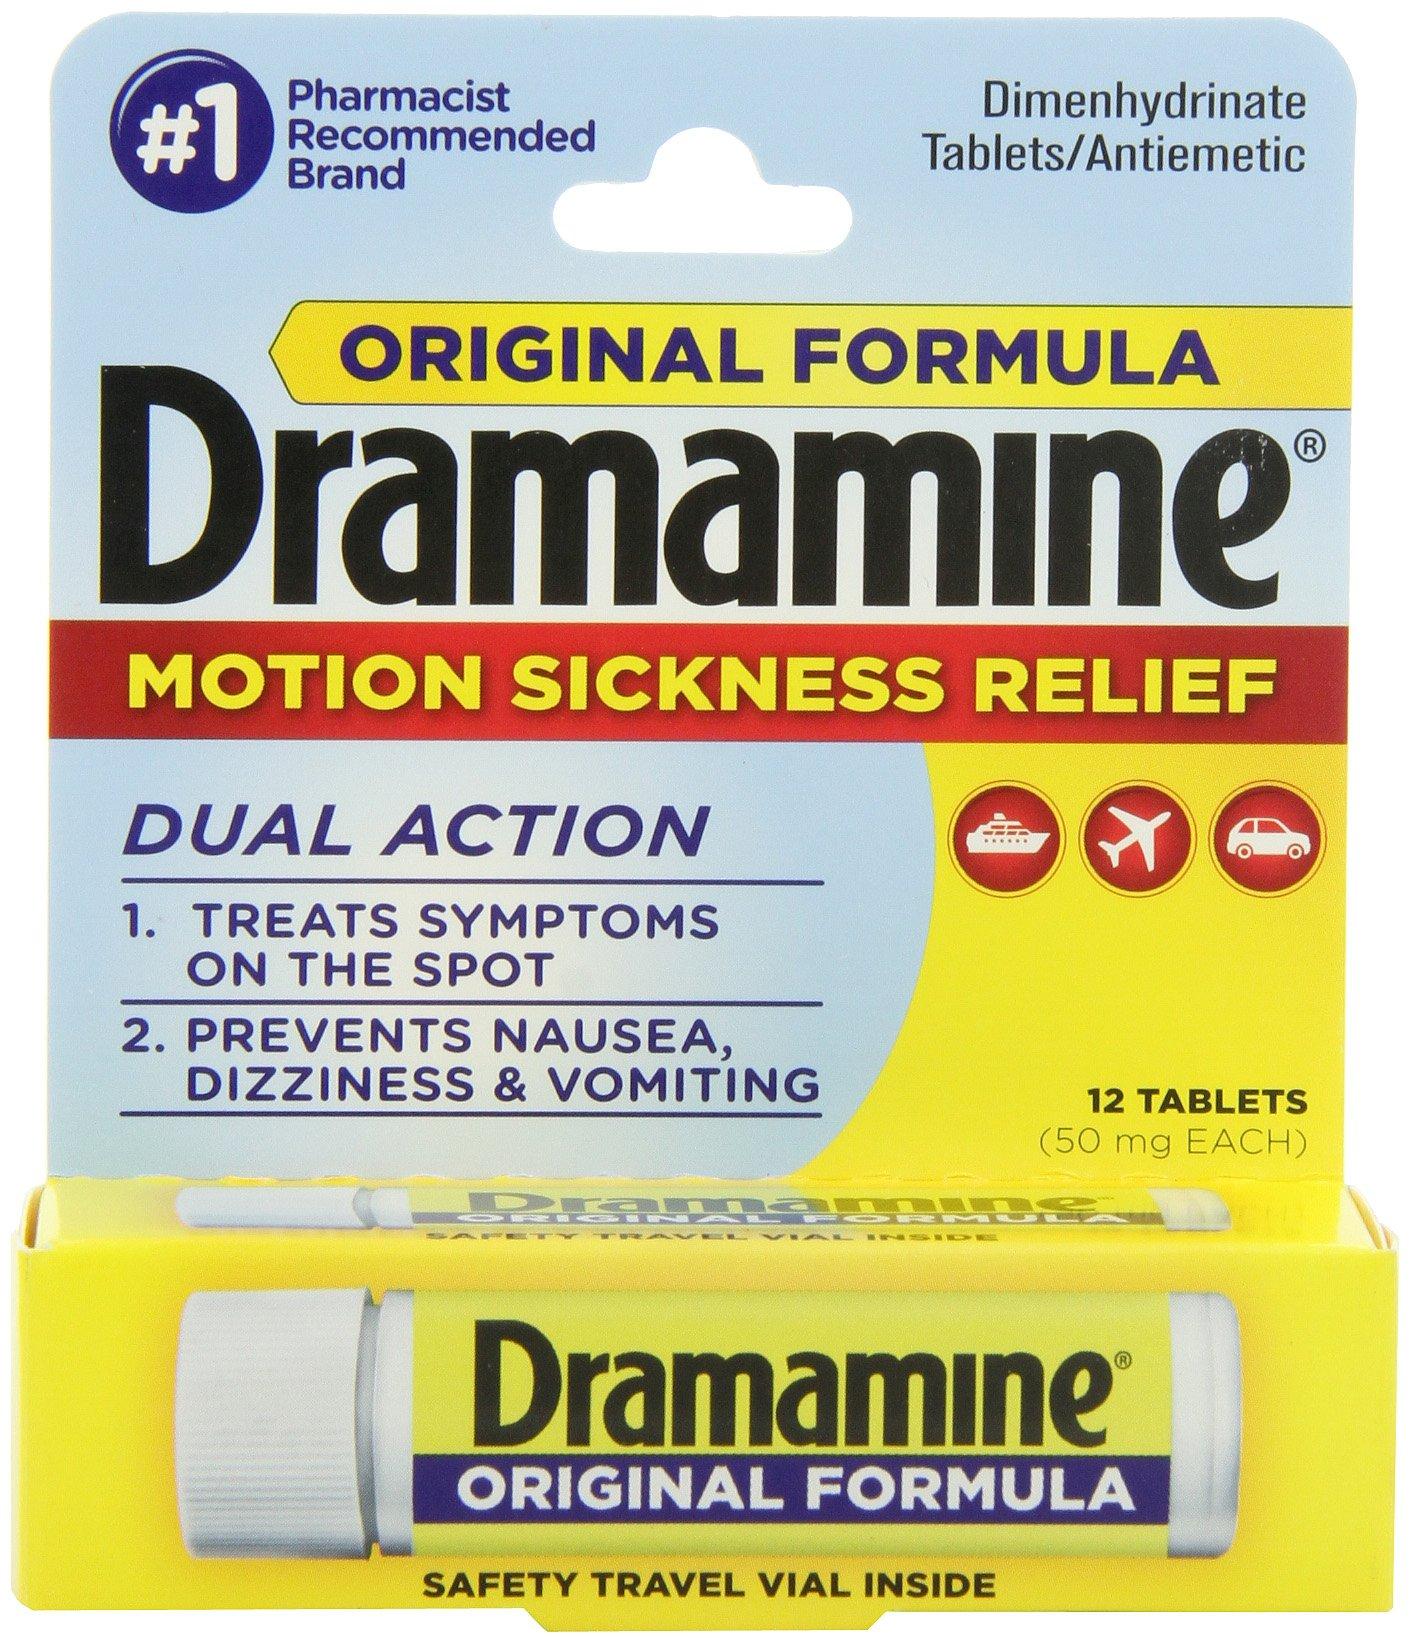 Dramamine Motion Sickness Relief Original Formula, 50 mg, 12 Count